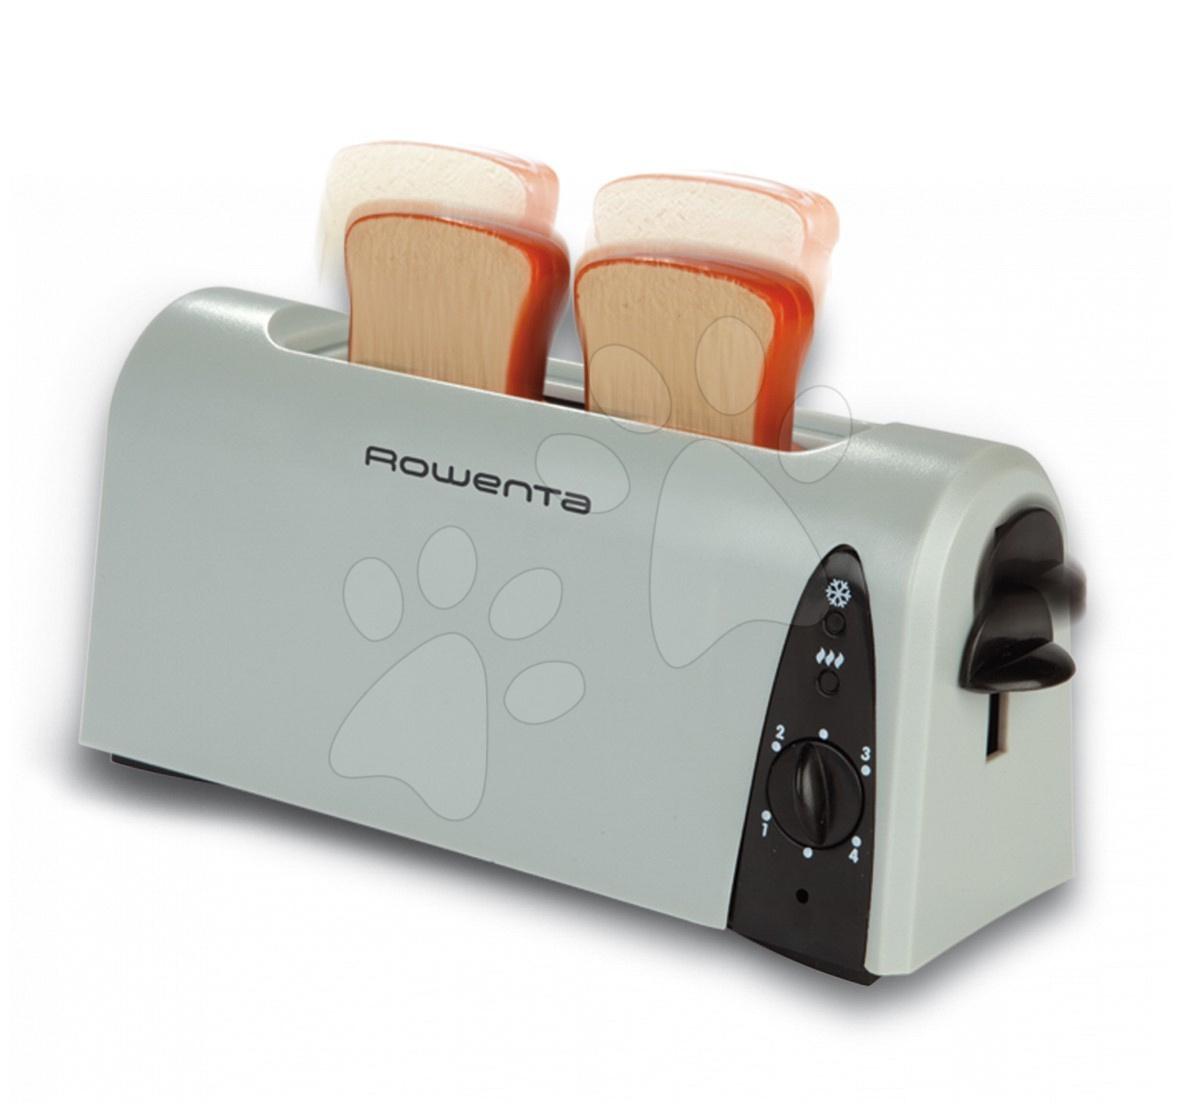 Elektronický toaster Krups Rowenta Smoby